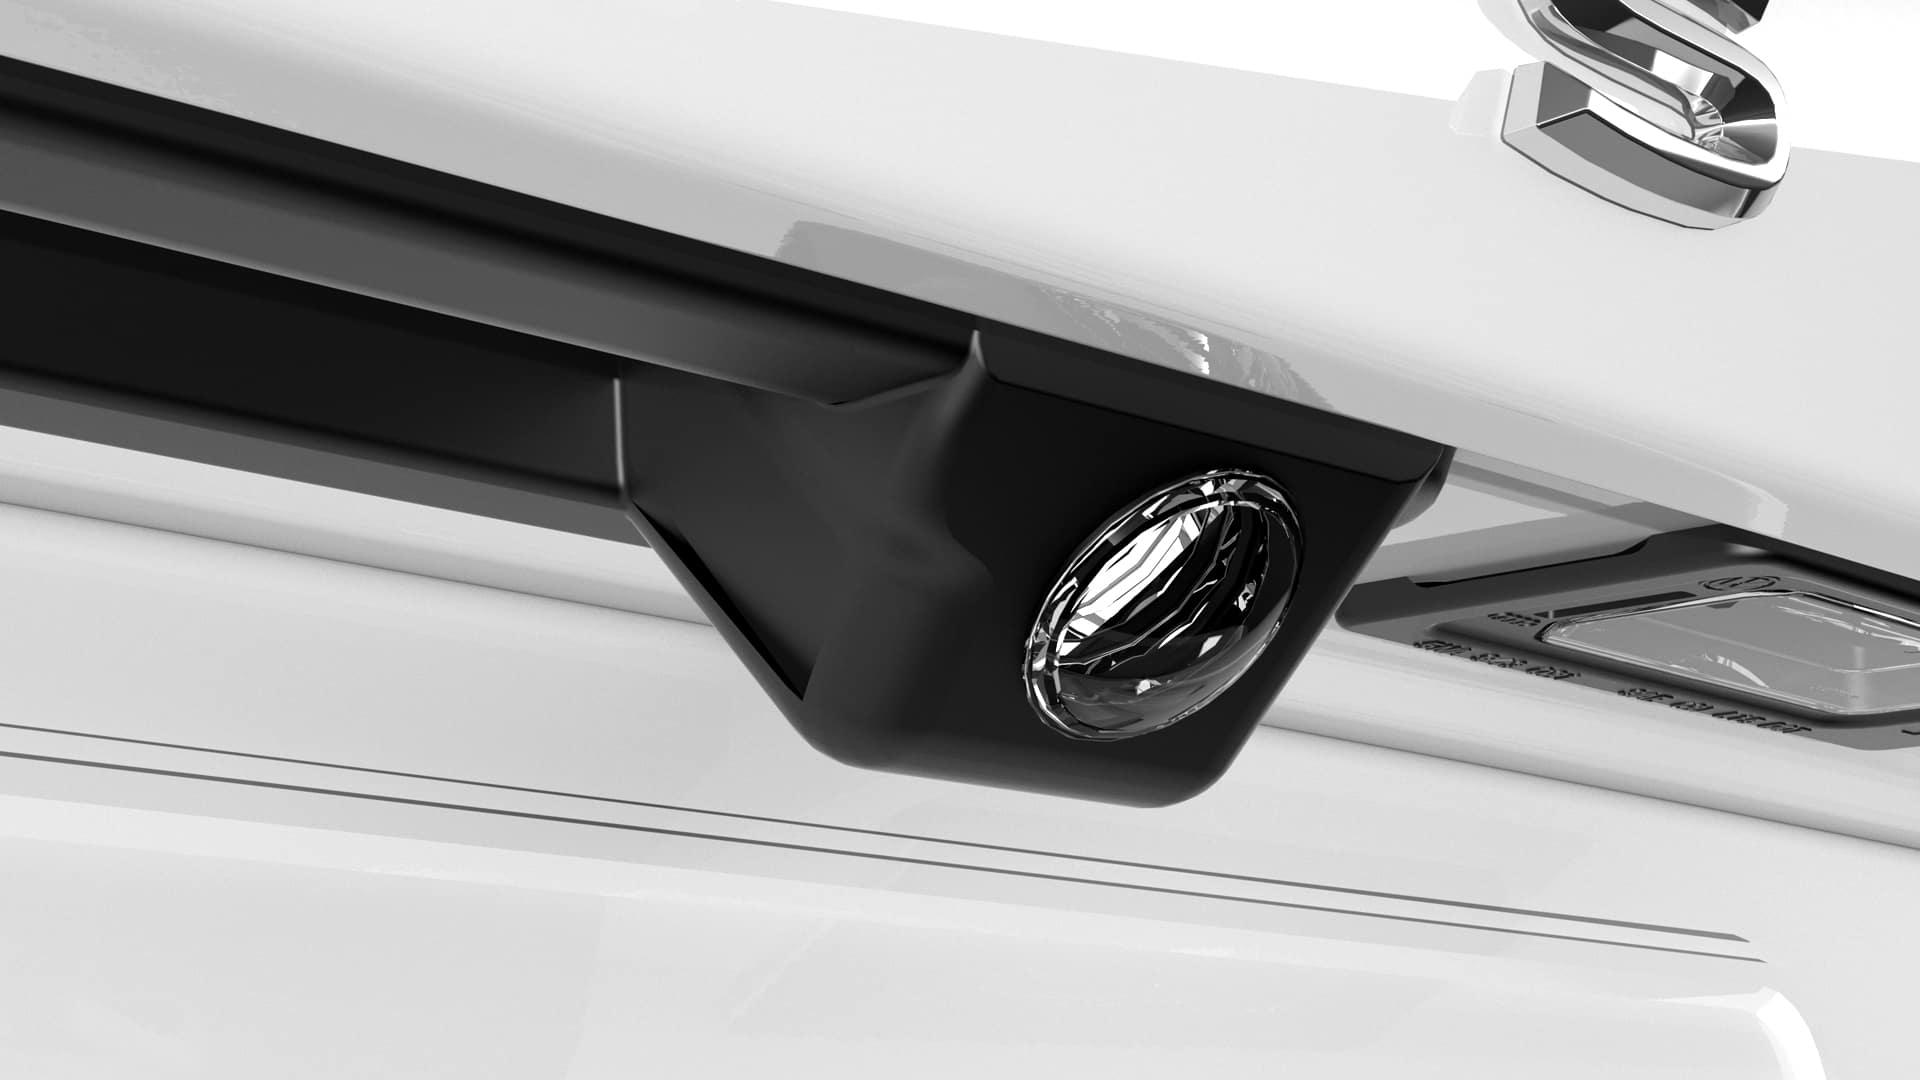 Passat rear-view camera